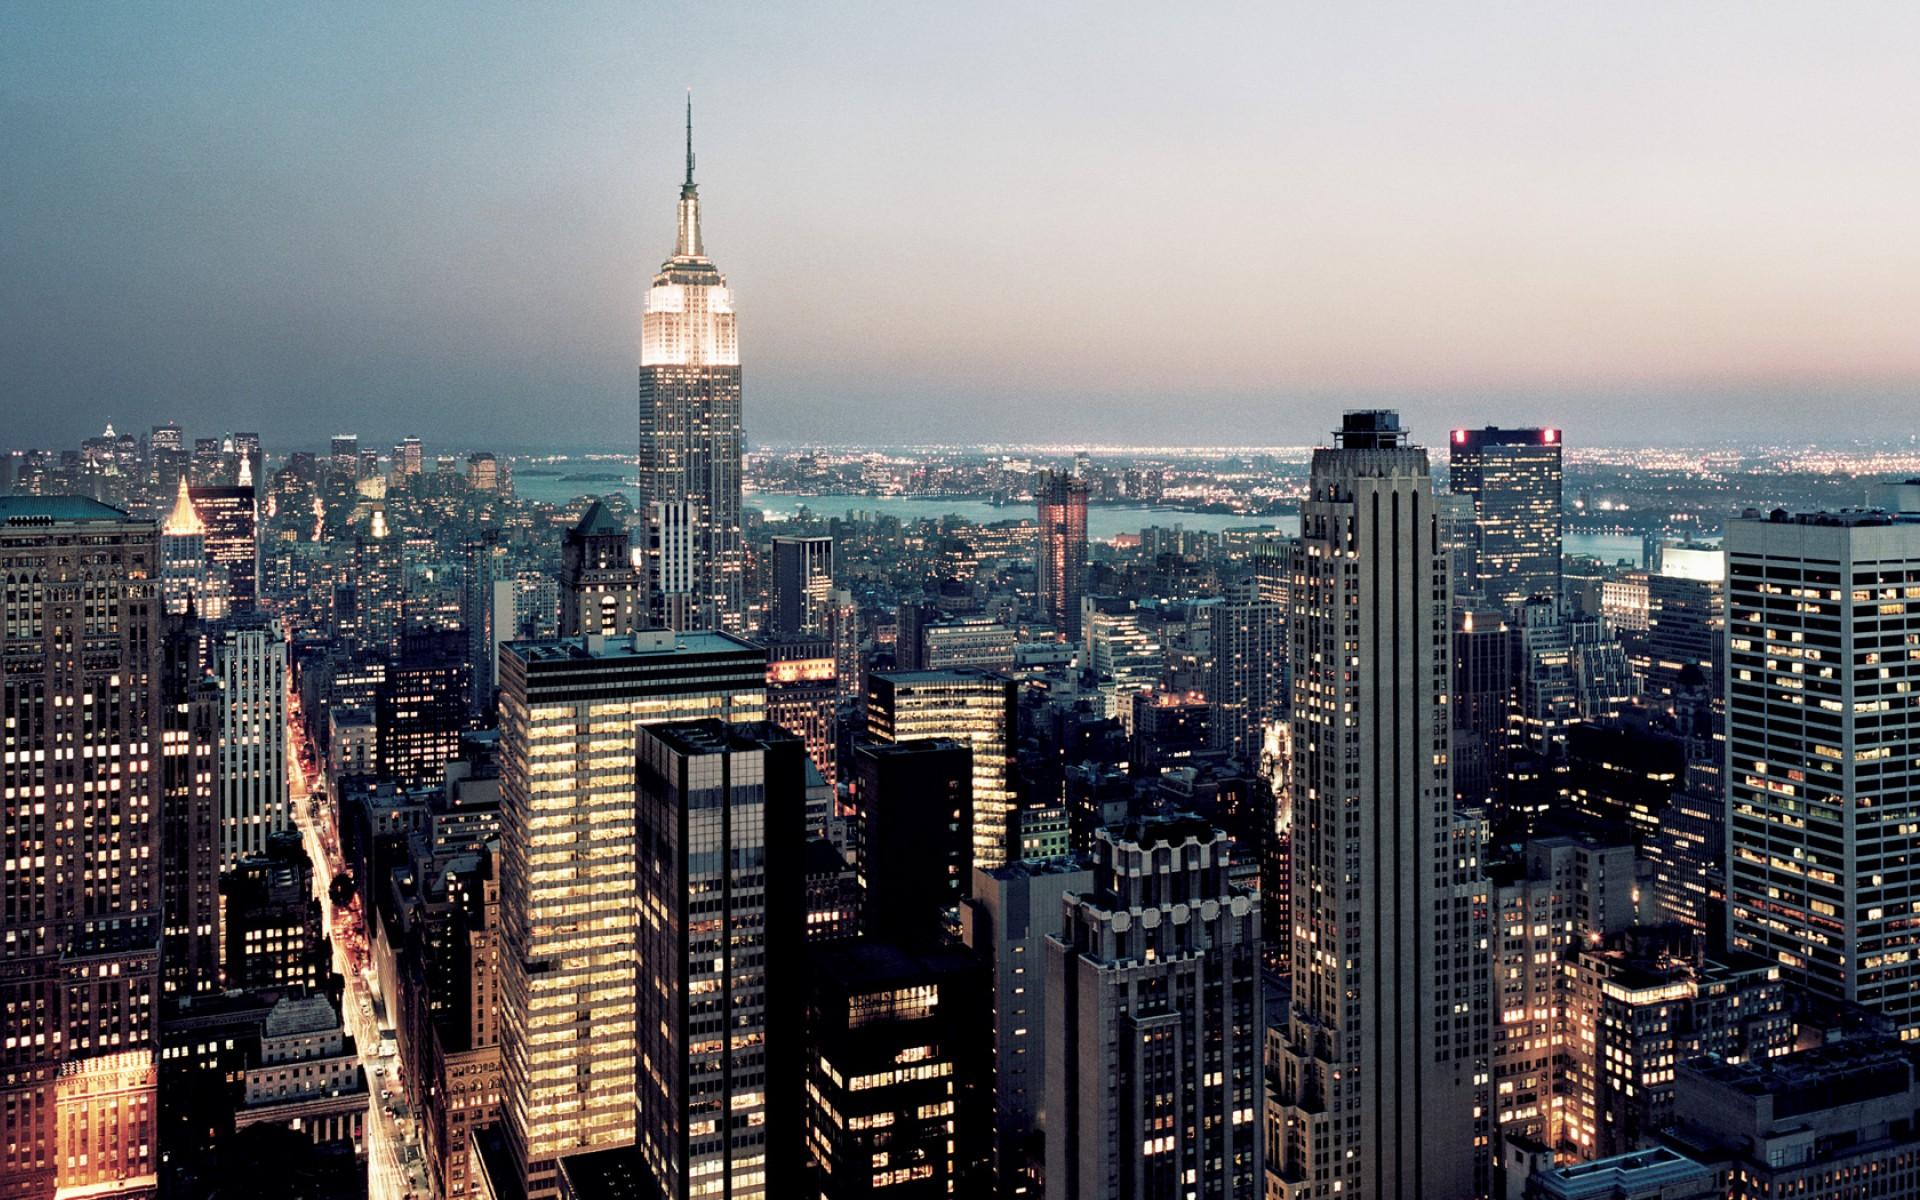 New York Hd Wallpaper Sf Wallpaper